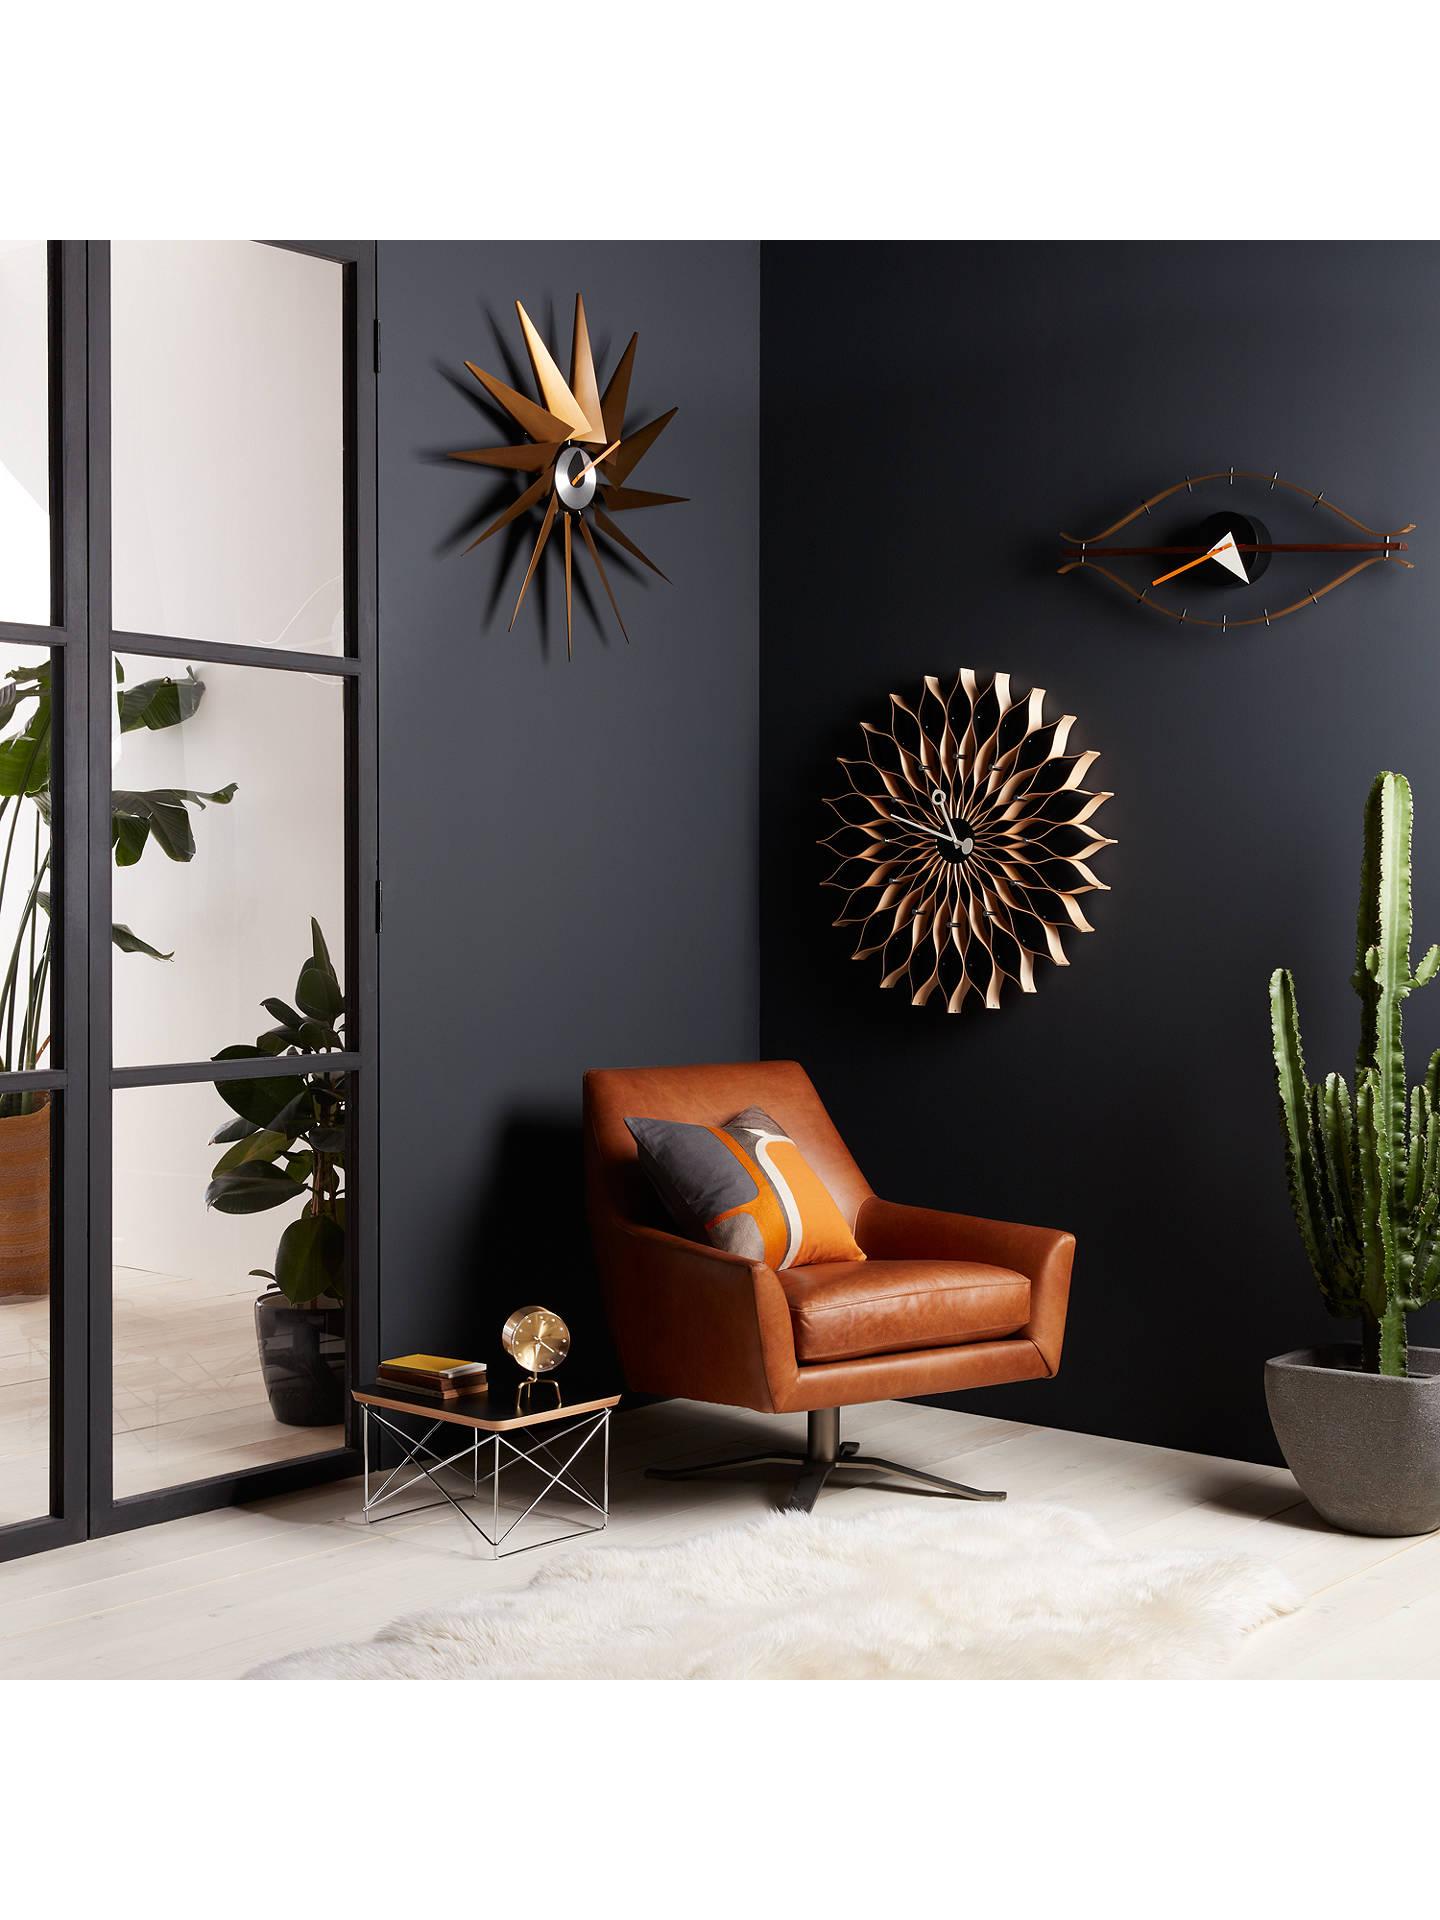 ac91100cbf1b ... Buy Vitra Sunflower Wall Clock